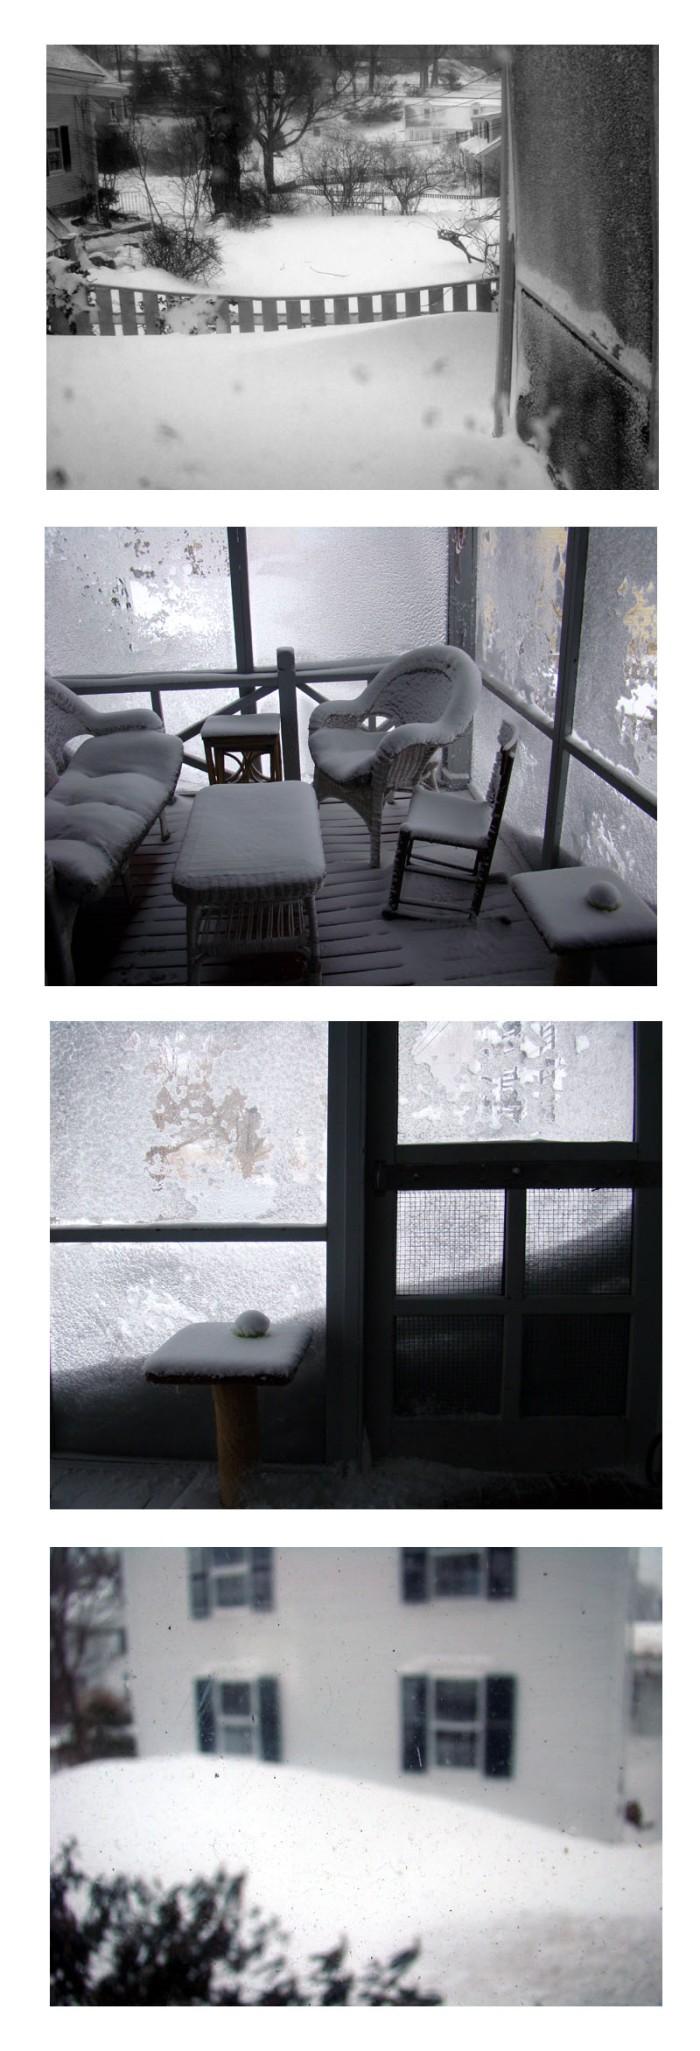 2013 blizzard 730am feb 9